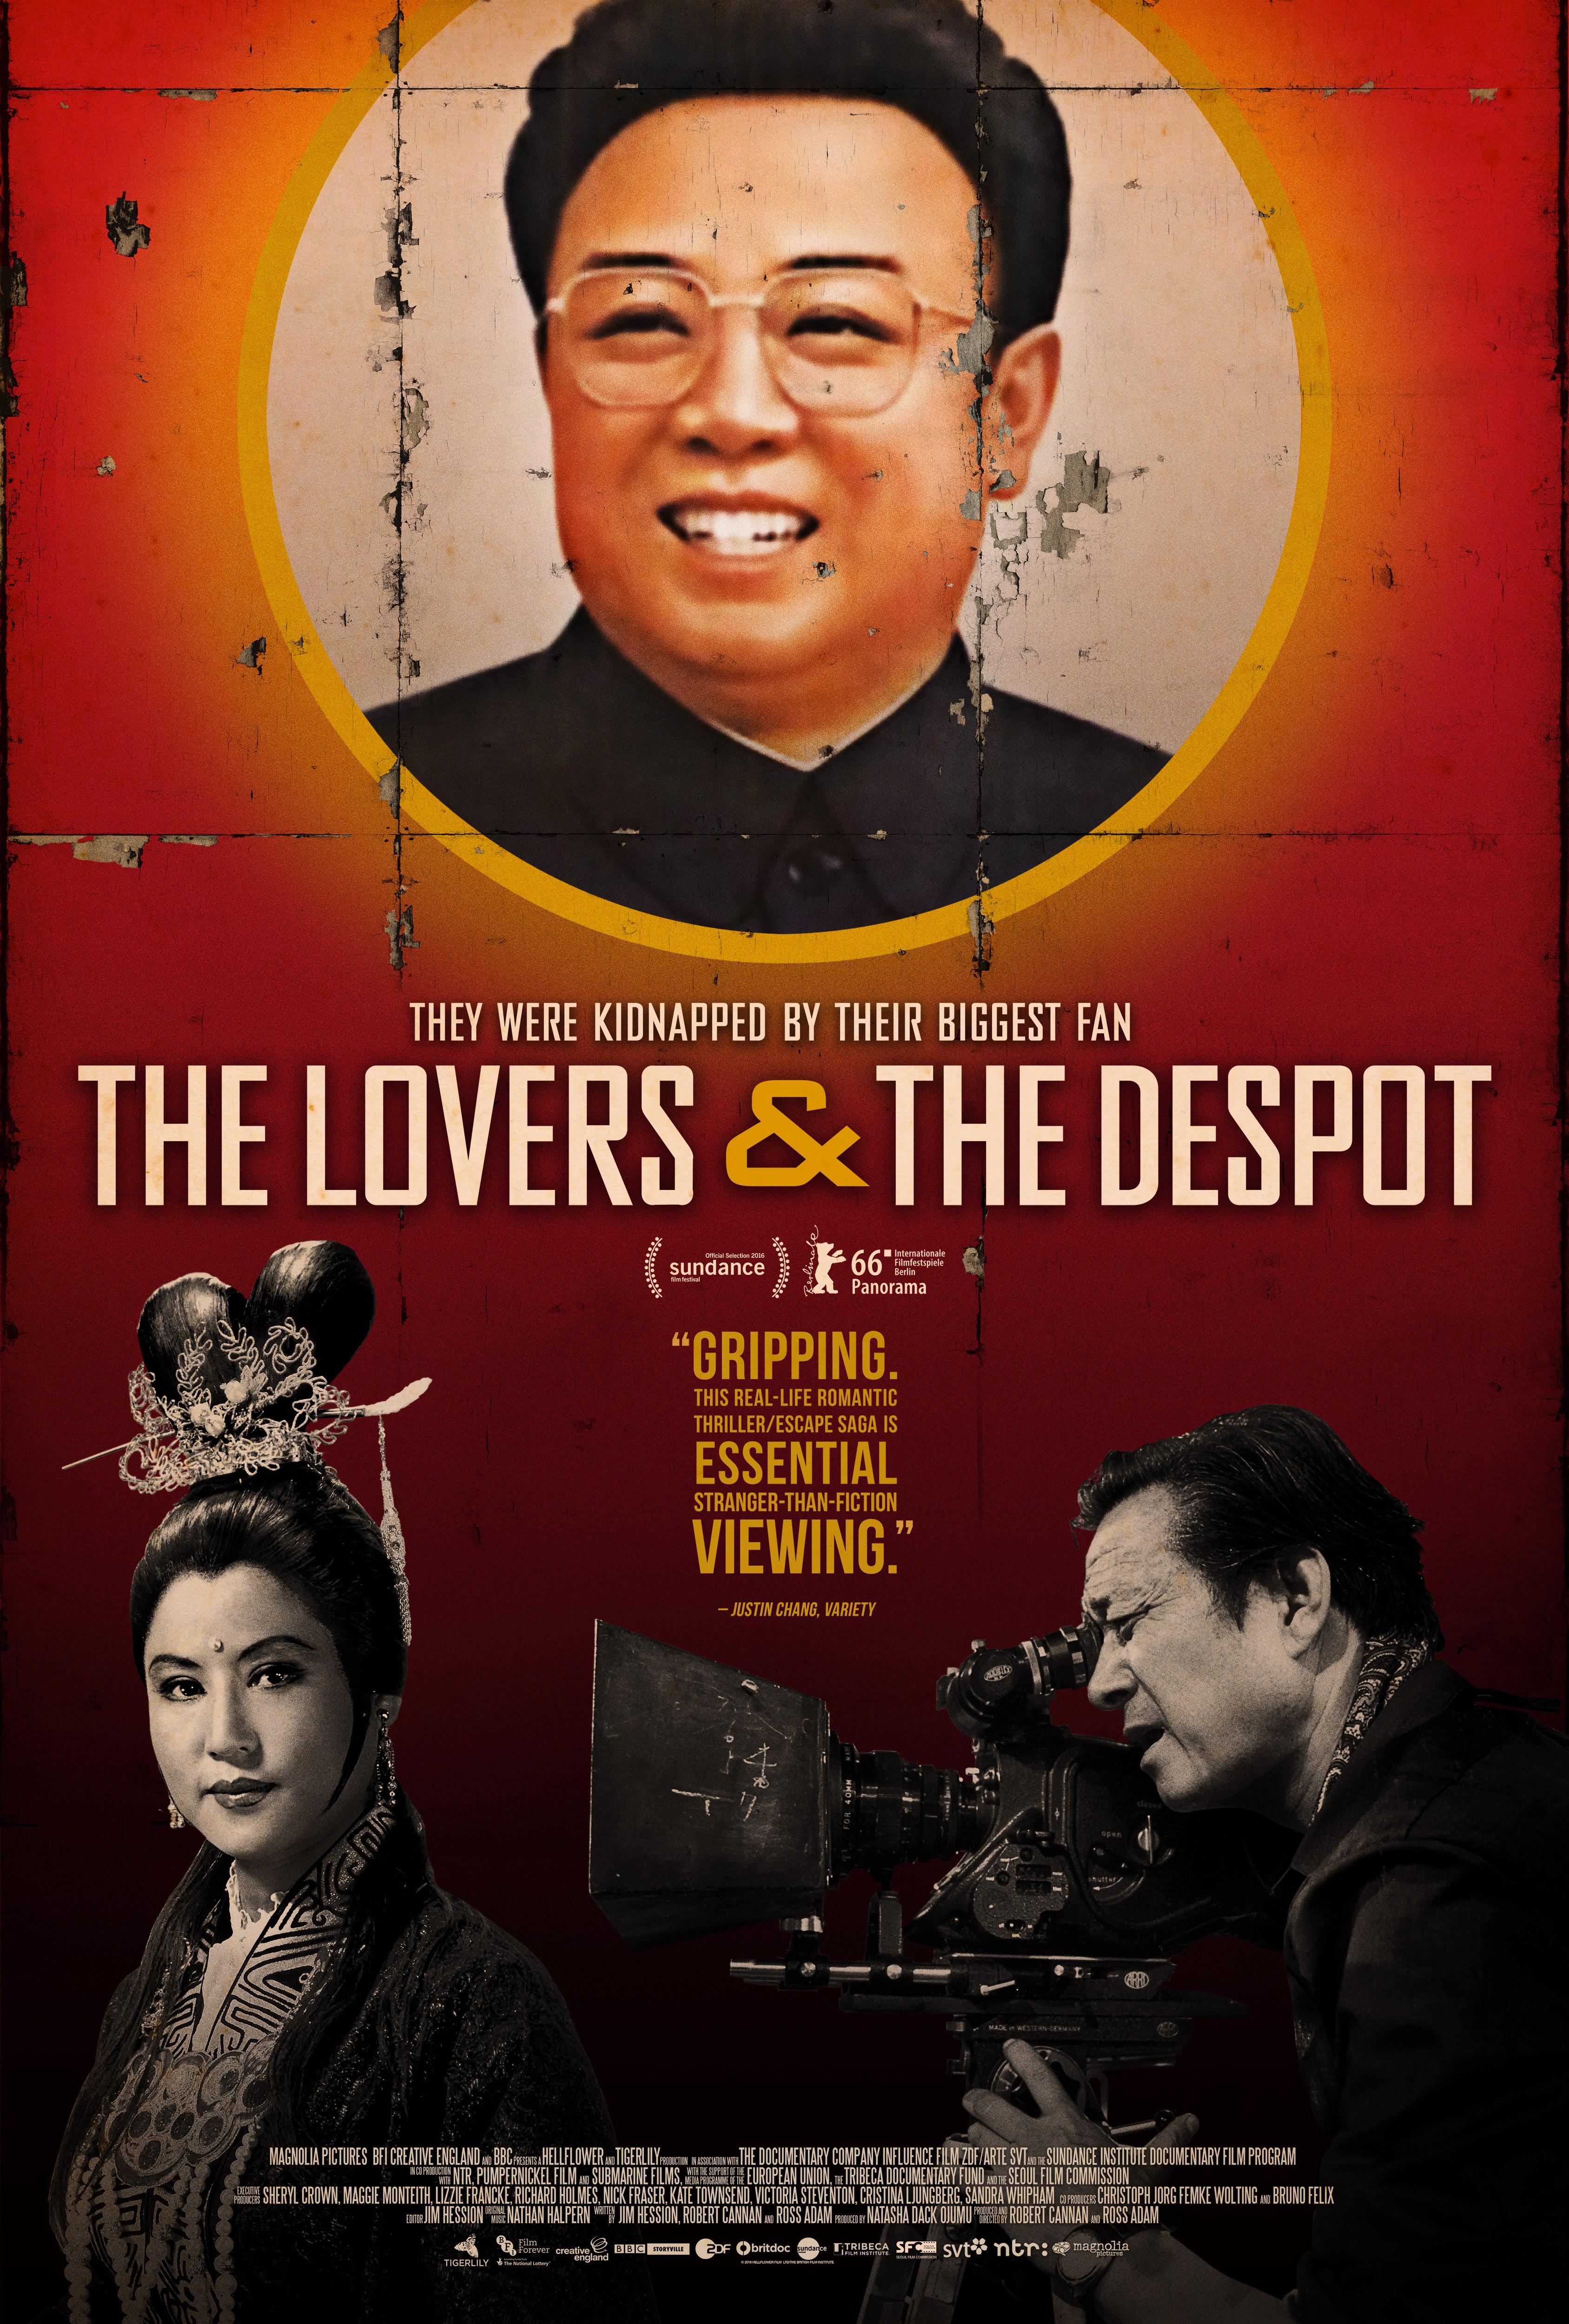 The Lovers & the Despot (2016) - IMDb